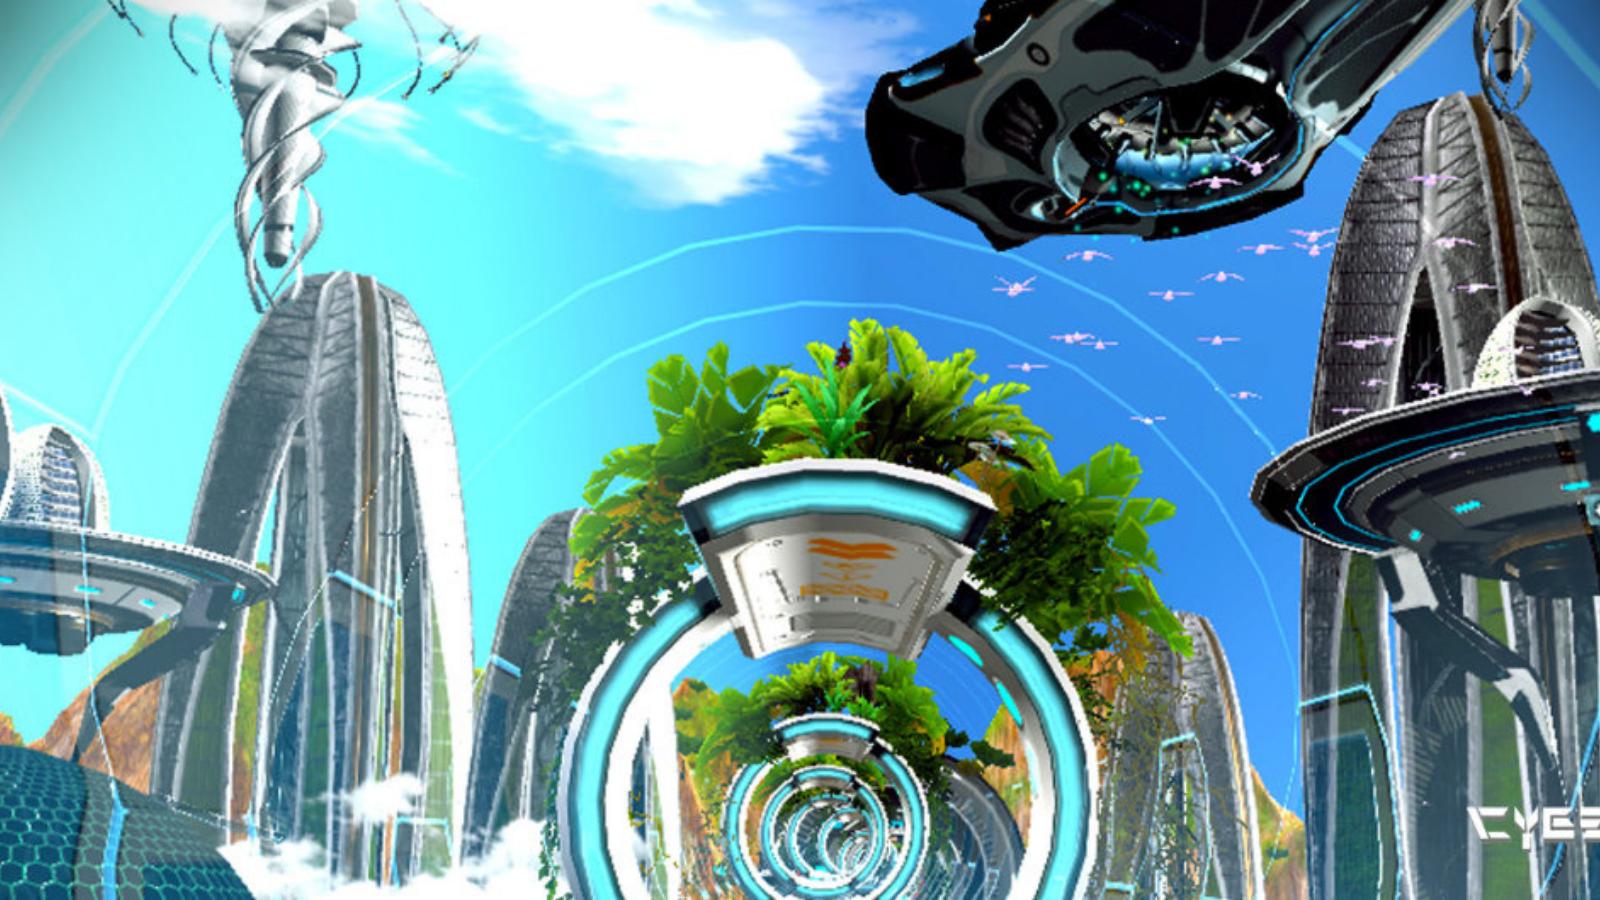 cyberpunk-holofit-virtual-reality-environment